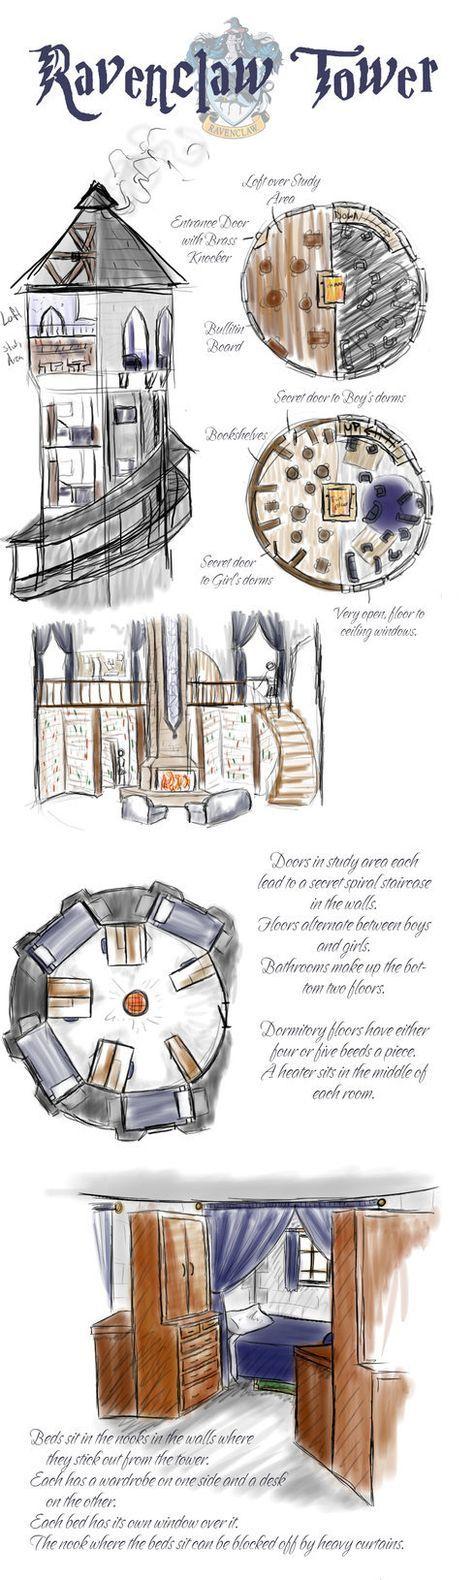 Hogwarts Common Room S More Here Harry Potter Universal Ravenclaw Harry Potter Fandom